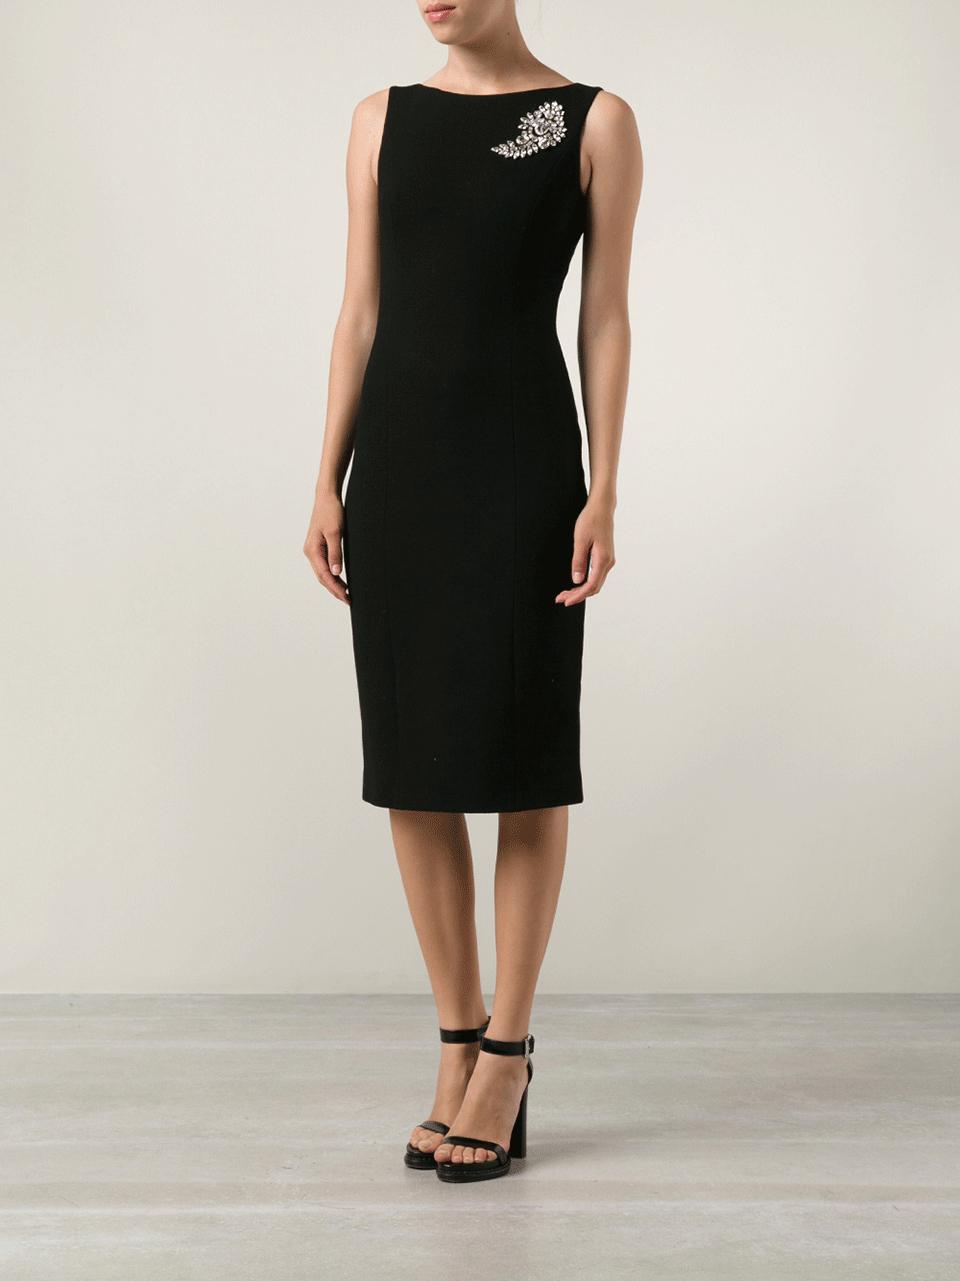 Michael Kors Paisley Brooch Sheath Dress In Black Lyst